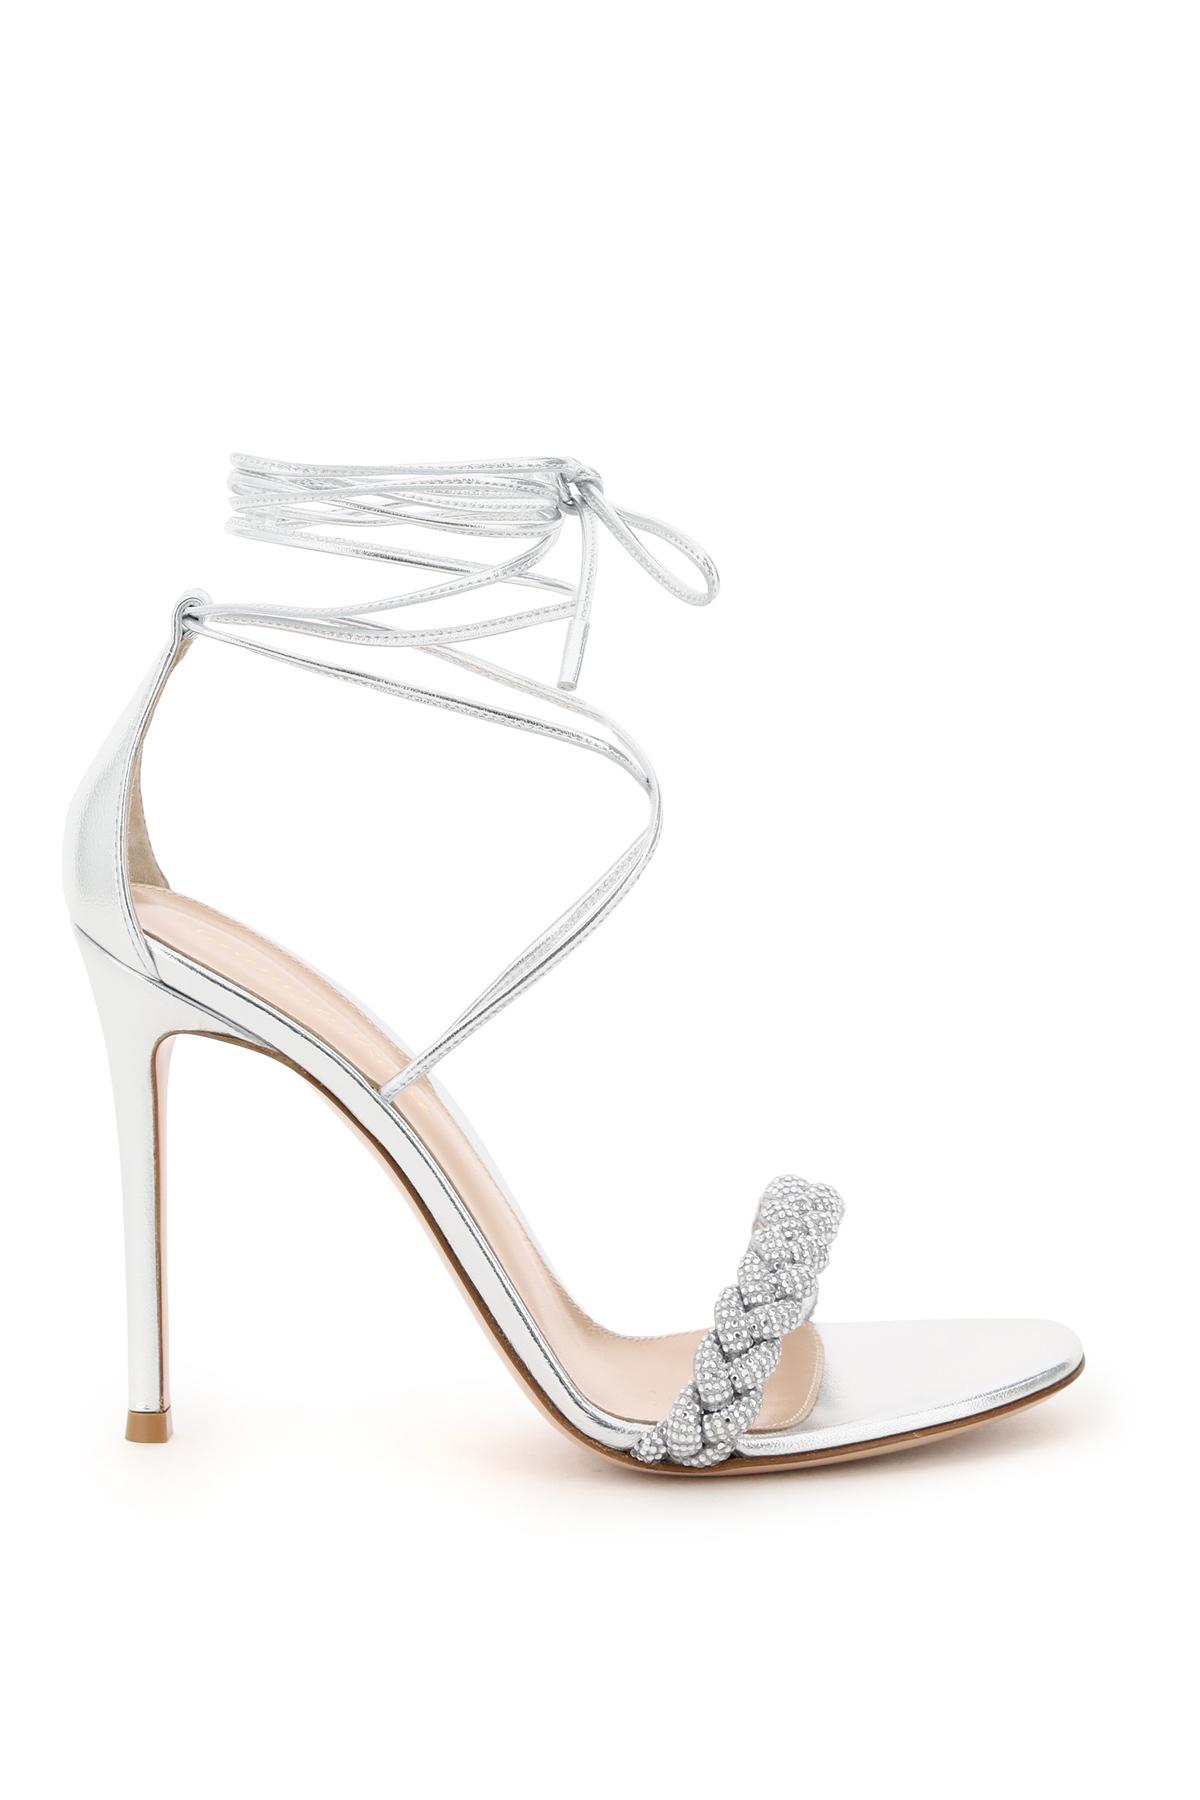 Gianvito rossi sandali crystal leomi